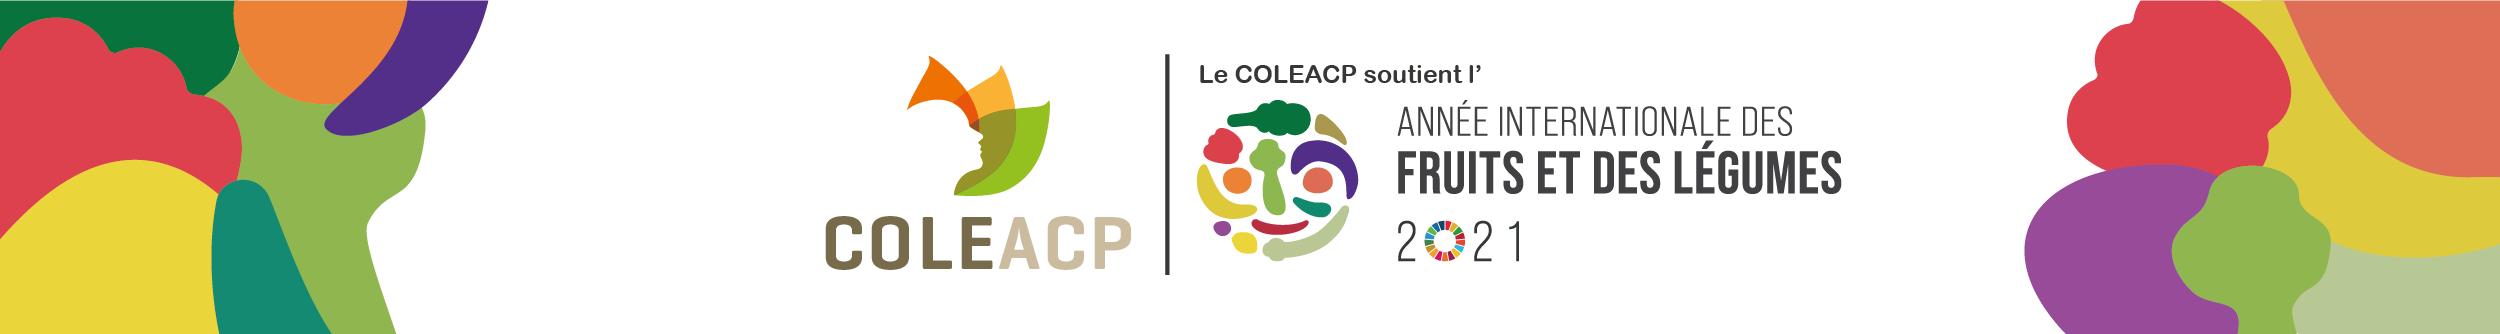 logo coleacp iyfv